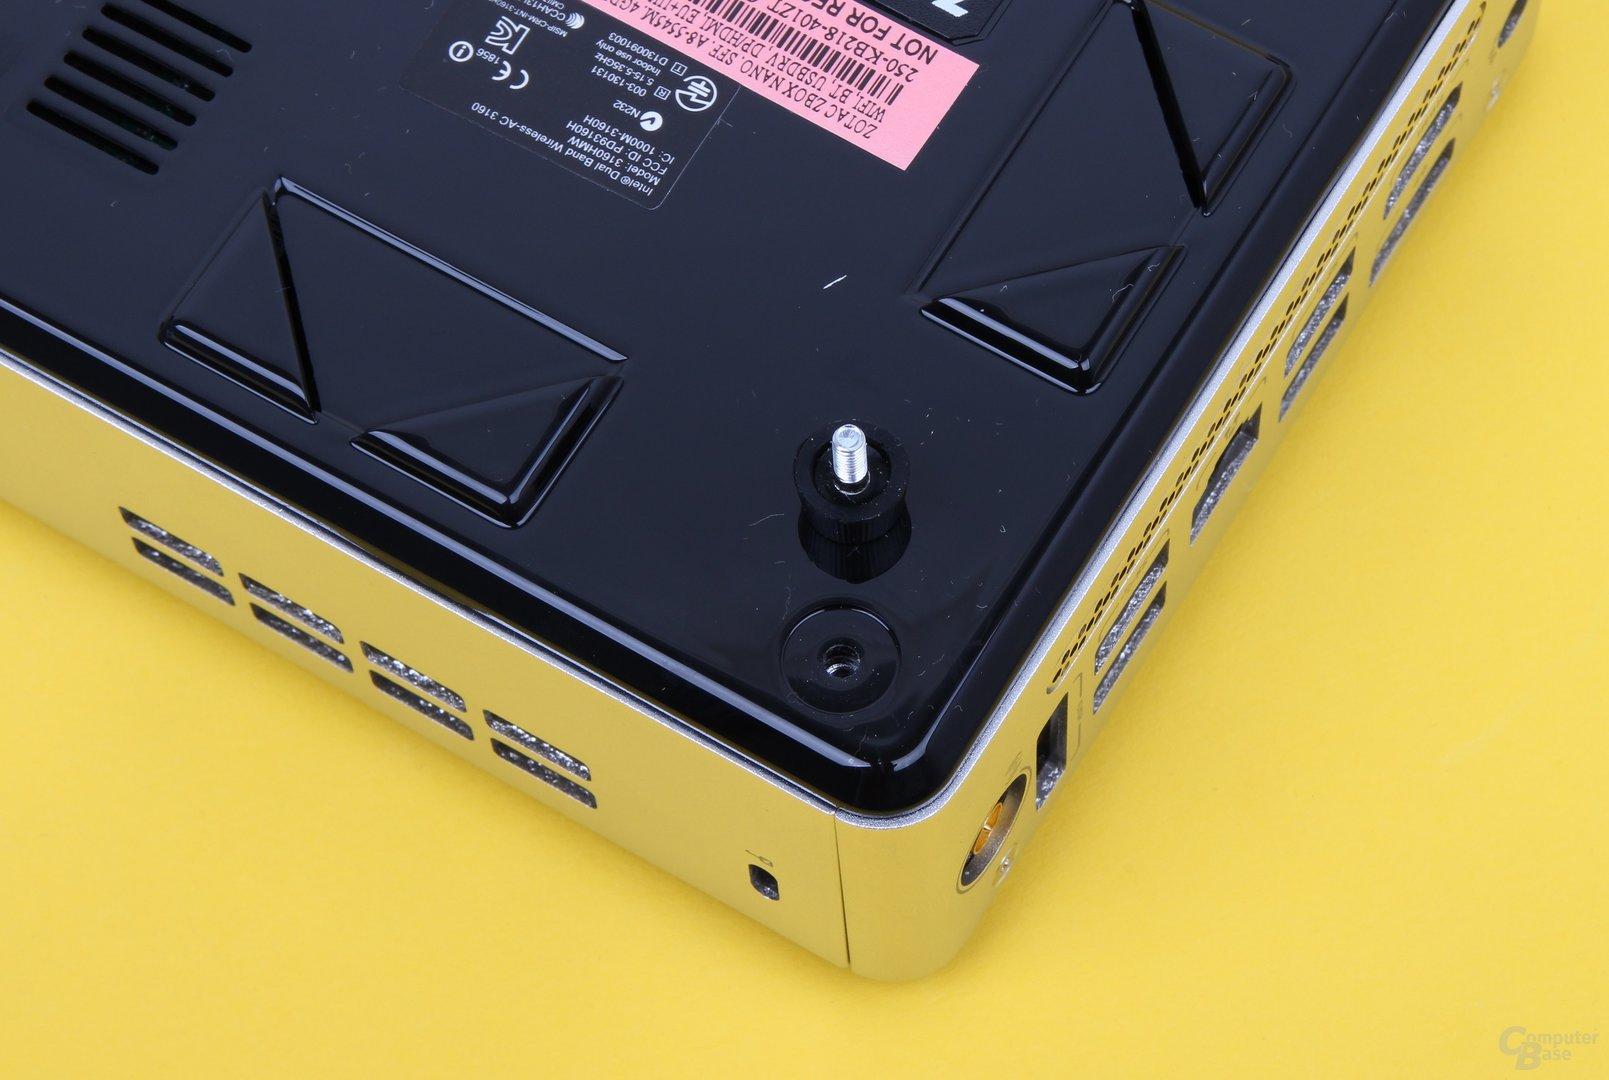 Zotac Zbox nano AQ02 Plus